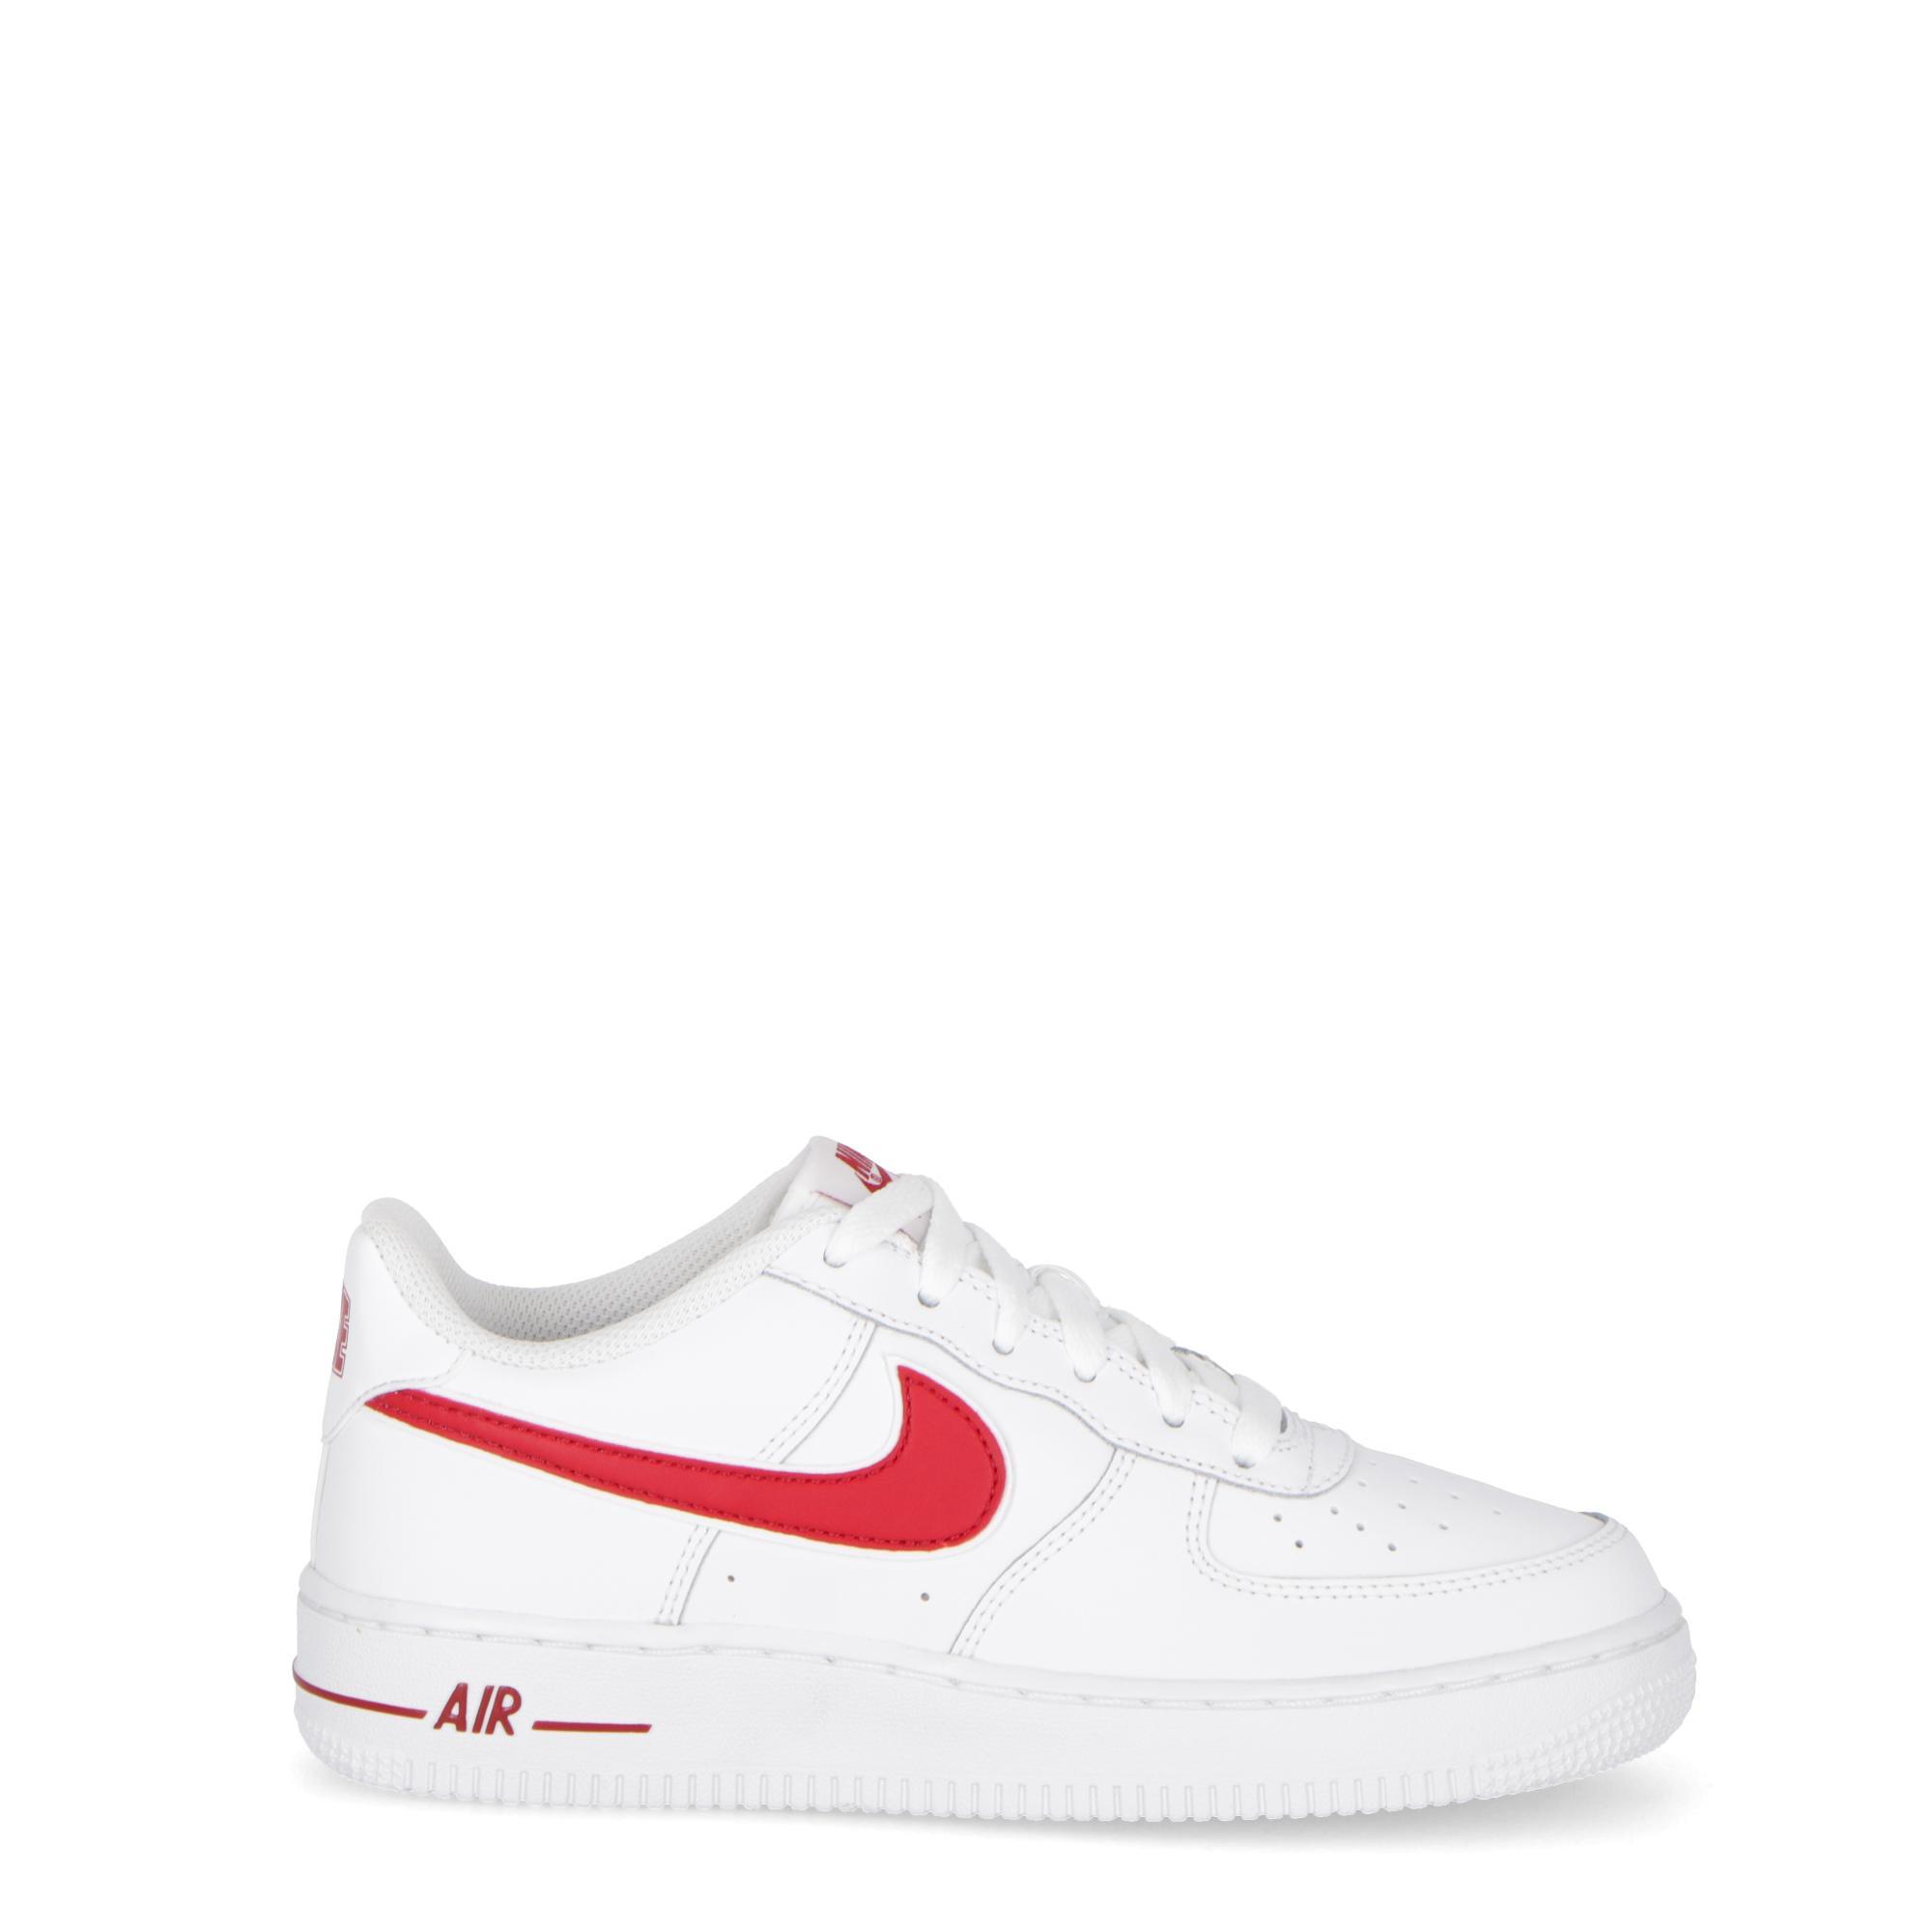 size 40 0a42c e91db Nike Air Force 1 3 (gs) - Kids White gym red